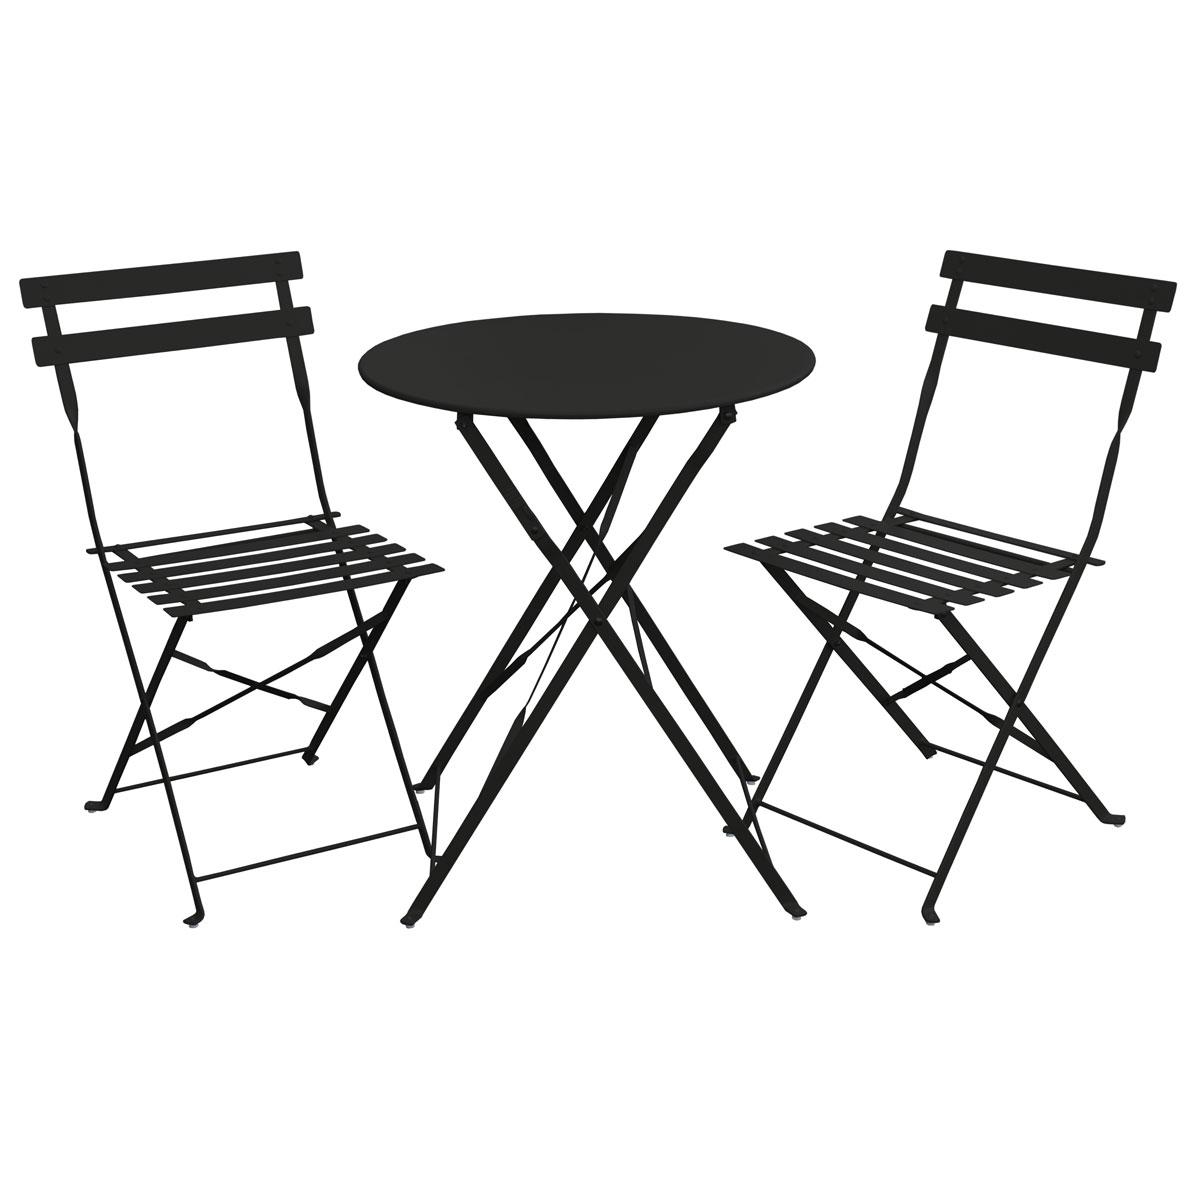 svita balkonm bel bistroset stuhl tisch klappbar bistro cafe metall gartenset ebay. Black Bedroom Furniture Sets. Home Design Ideas